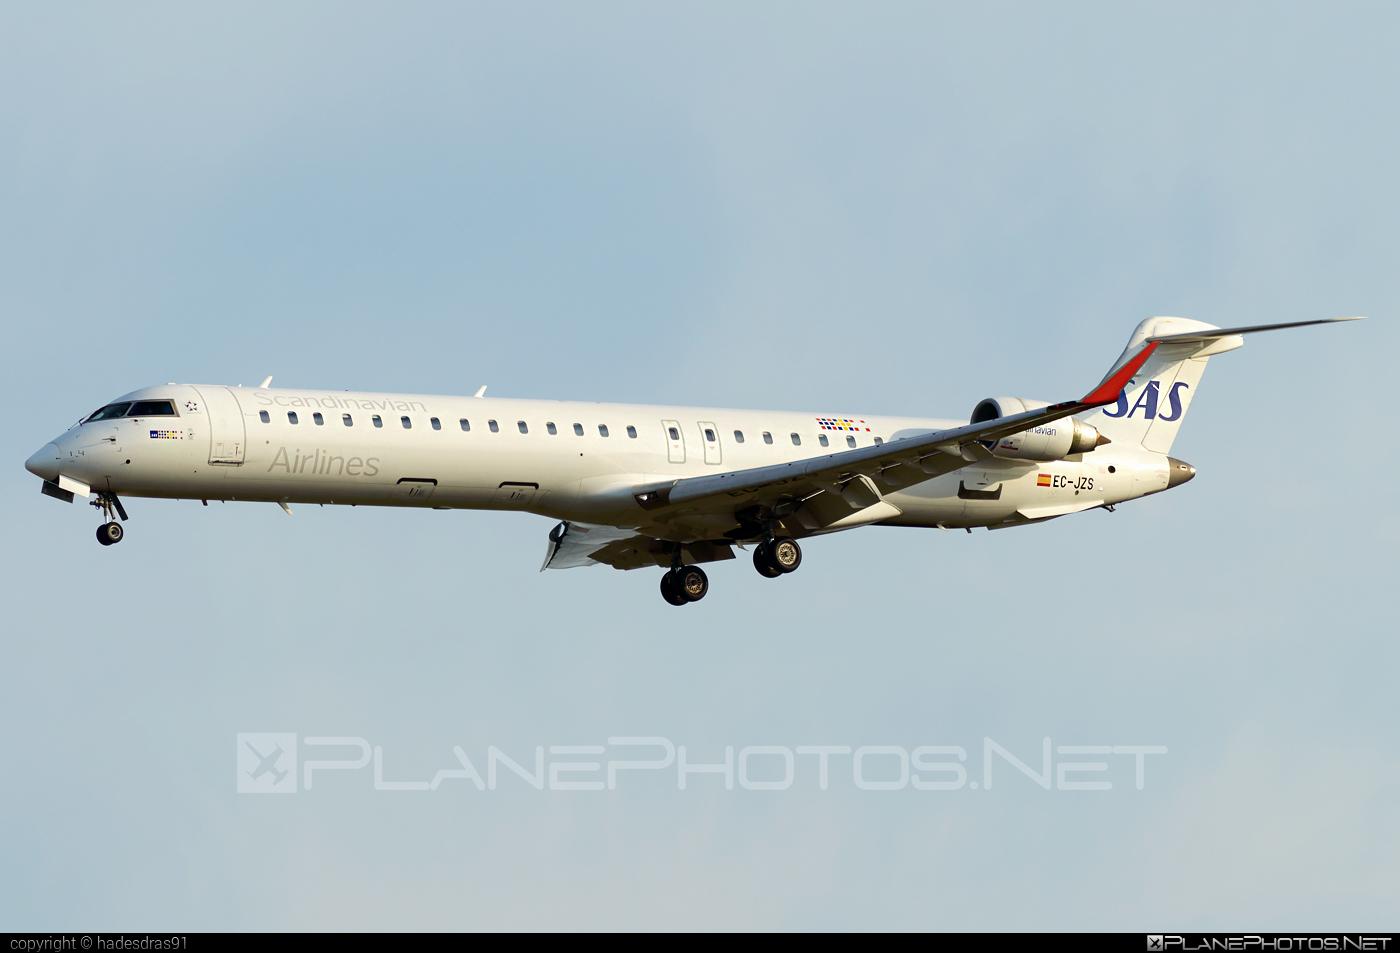 Bombardier CRJ900 - EC-JZS operated by Scandinavian Airlines (SAS) #bombardier #crj900 #sas #sasairlines #scandinavianairlines